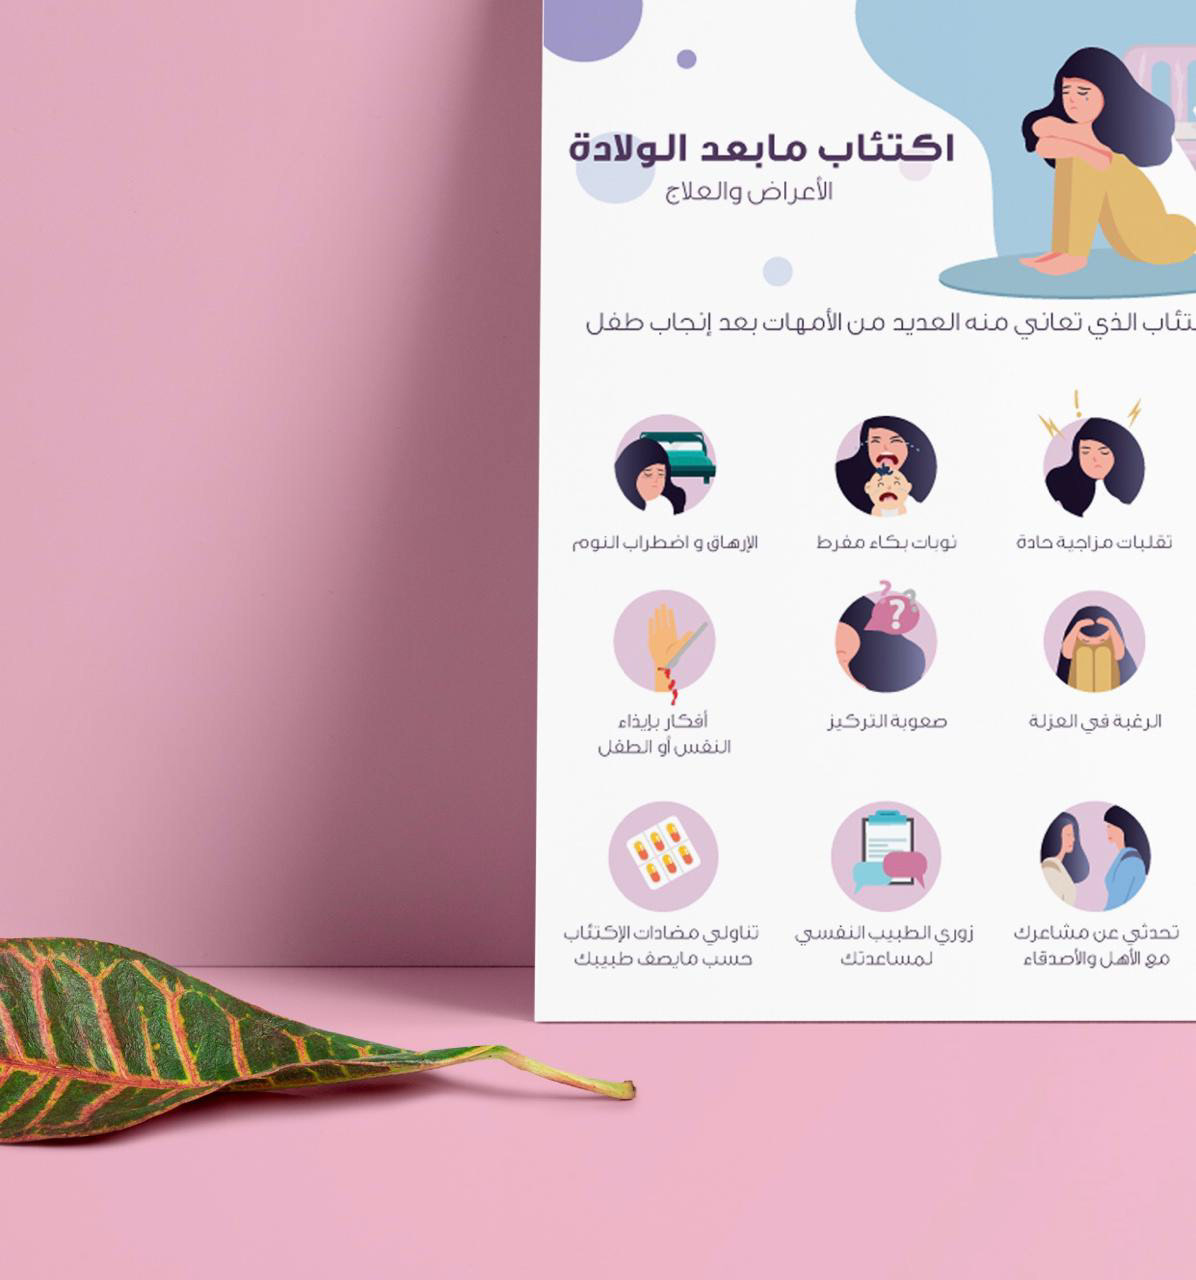 Postpartum depression- infographic - Waai Award on Behance